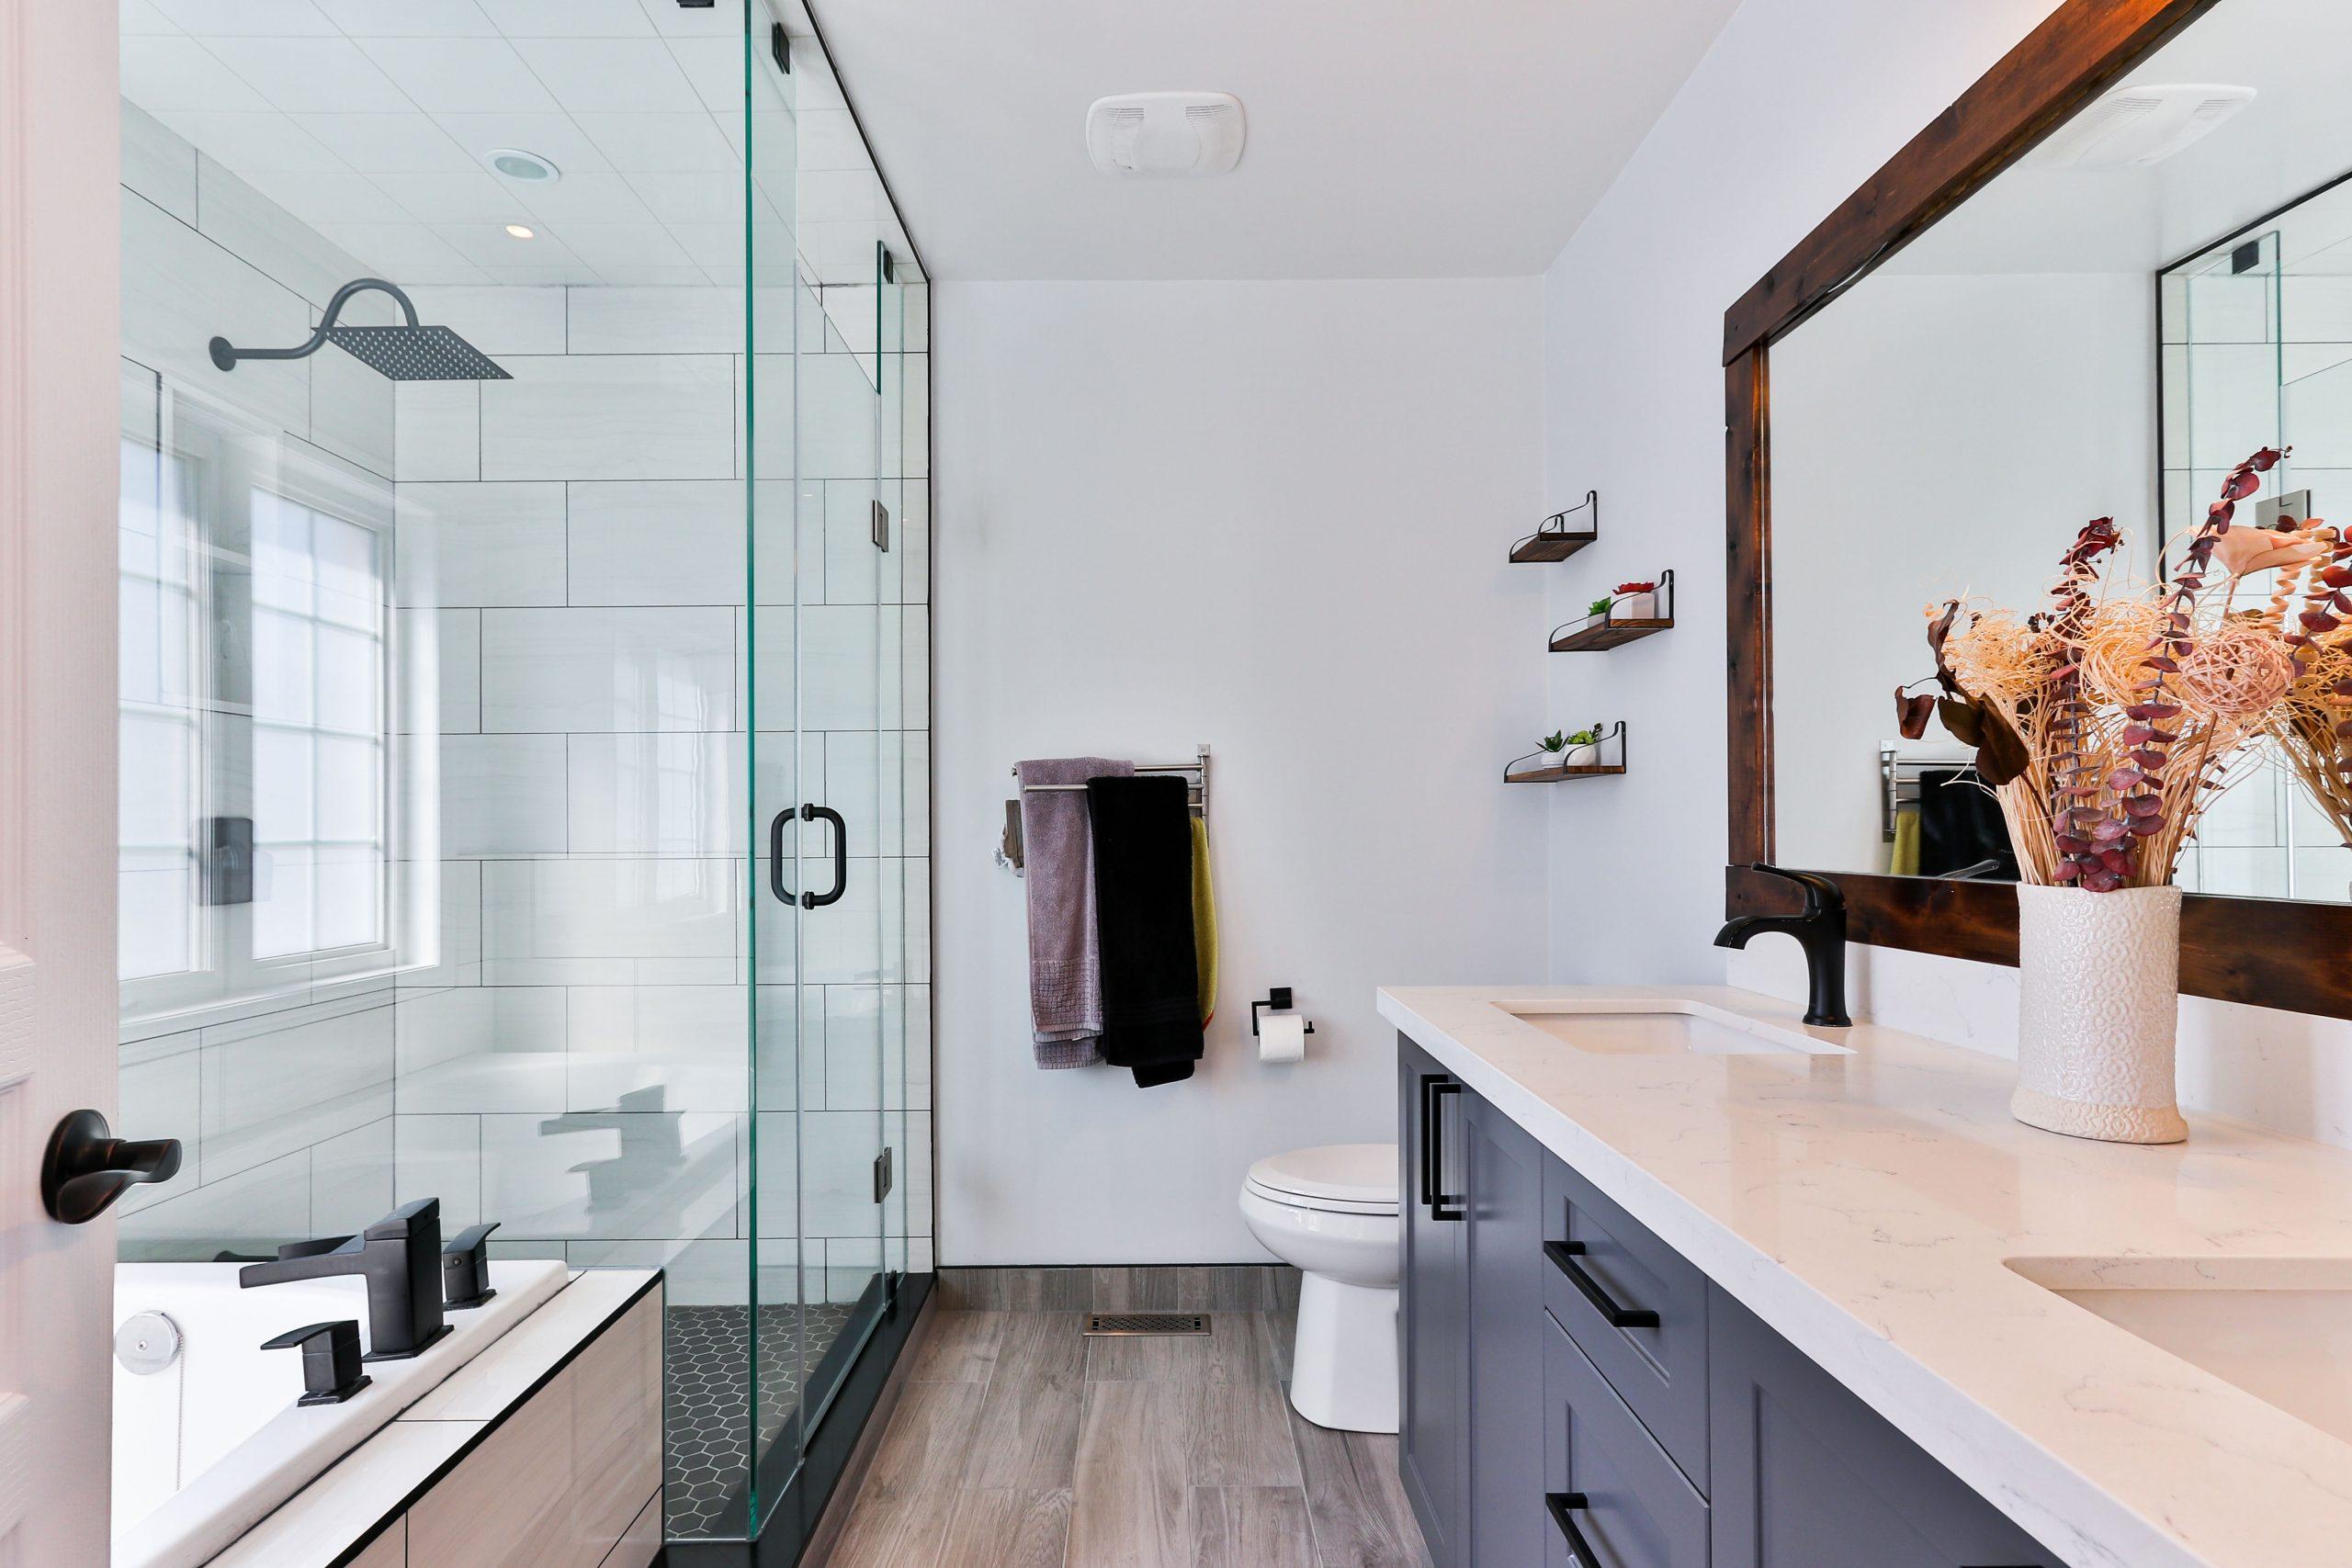 Bathroom Storage Ideas to Help Cut Down on Clutter